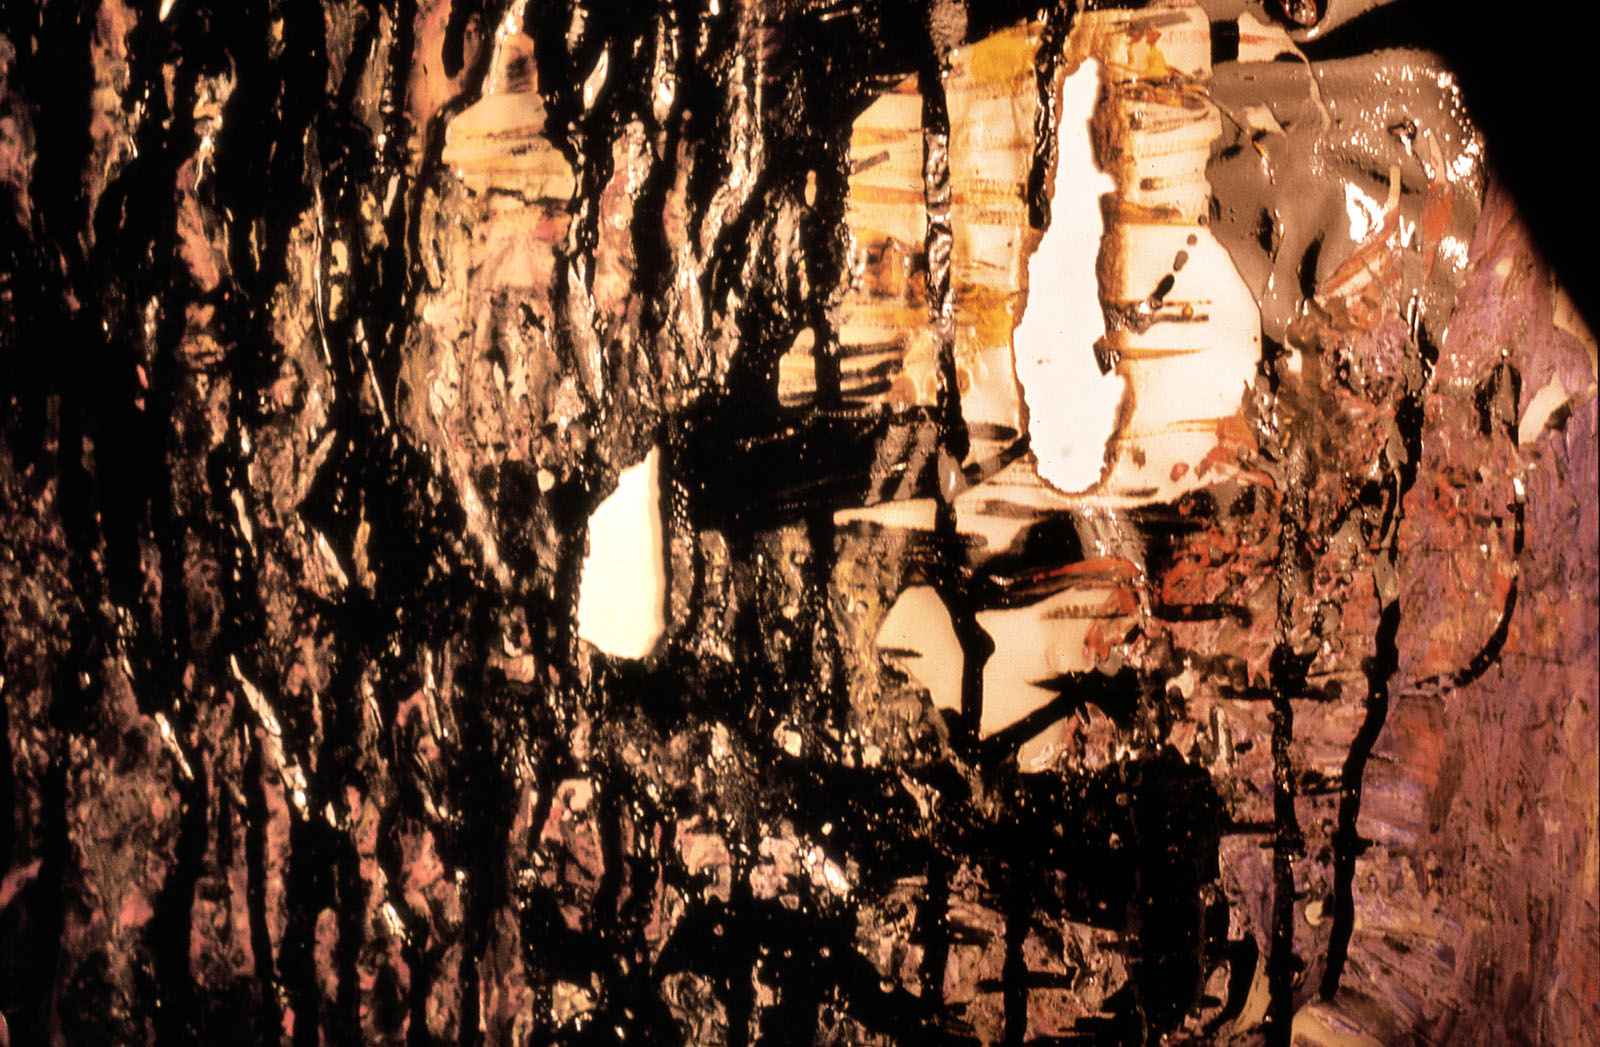 panies-danielvillalobos-spanish-painting-abstractexpressionism-6